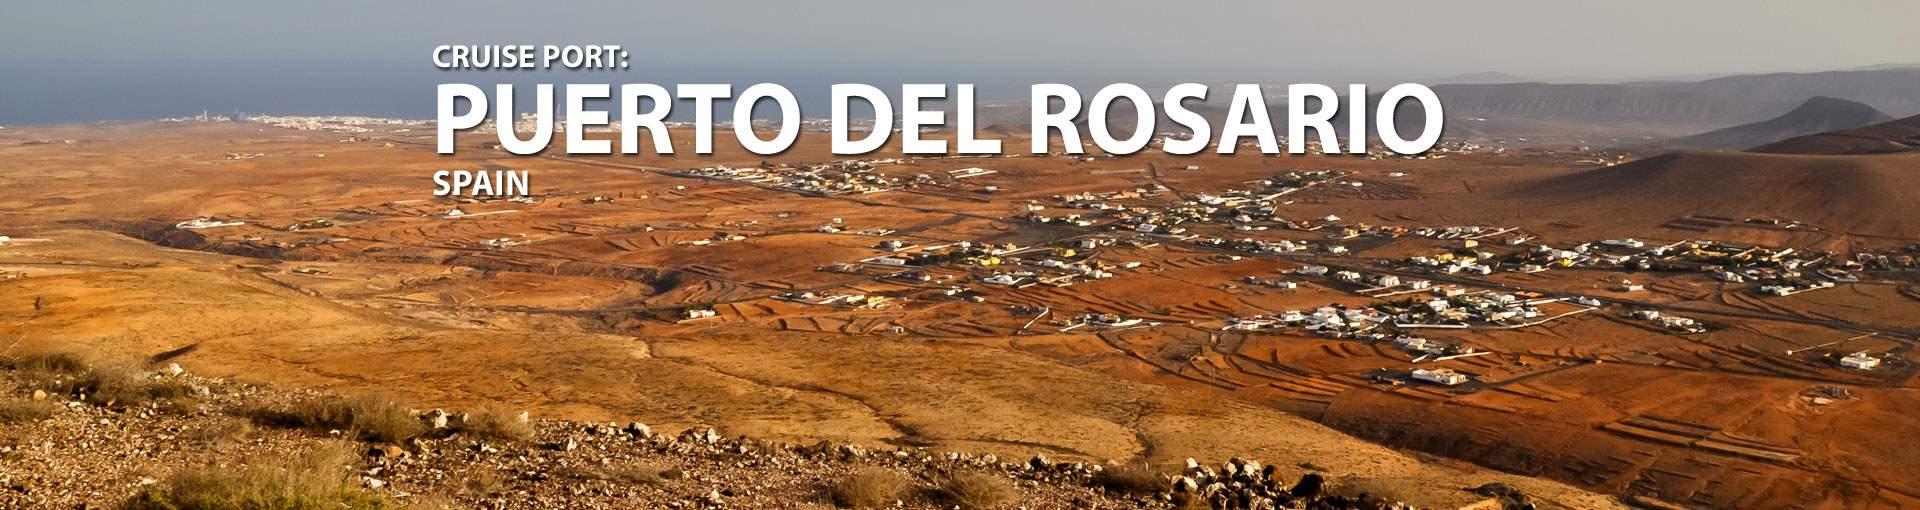 Cruises to Puerto Del Rosario, Spain